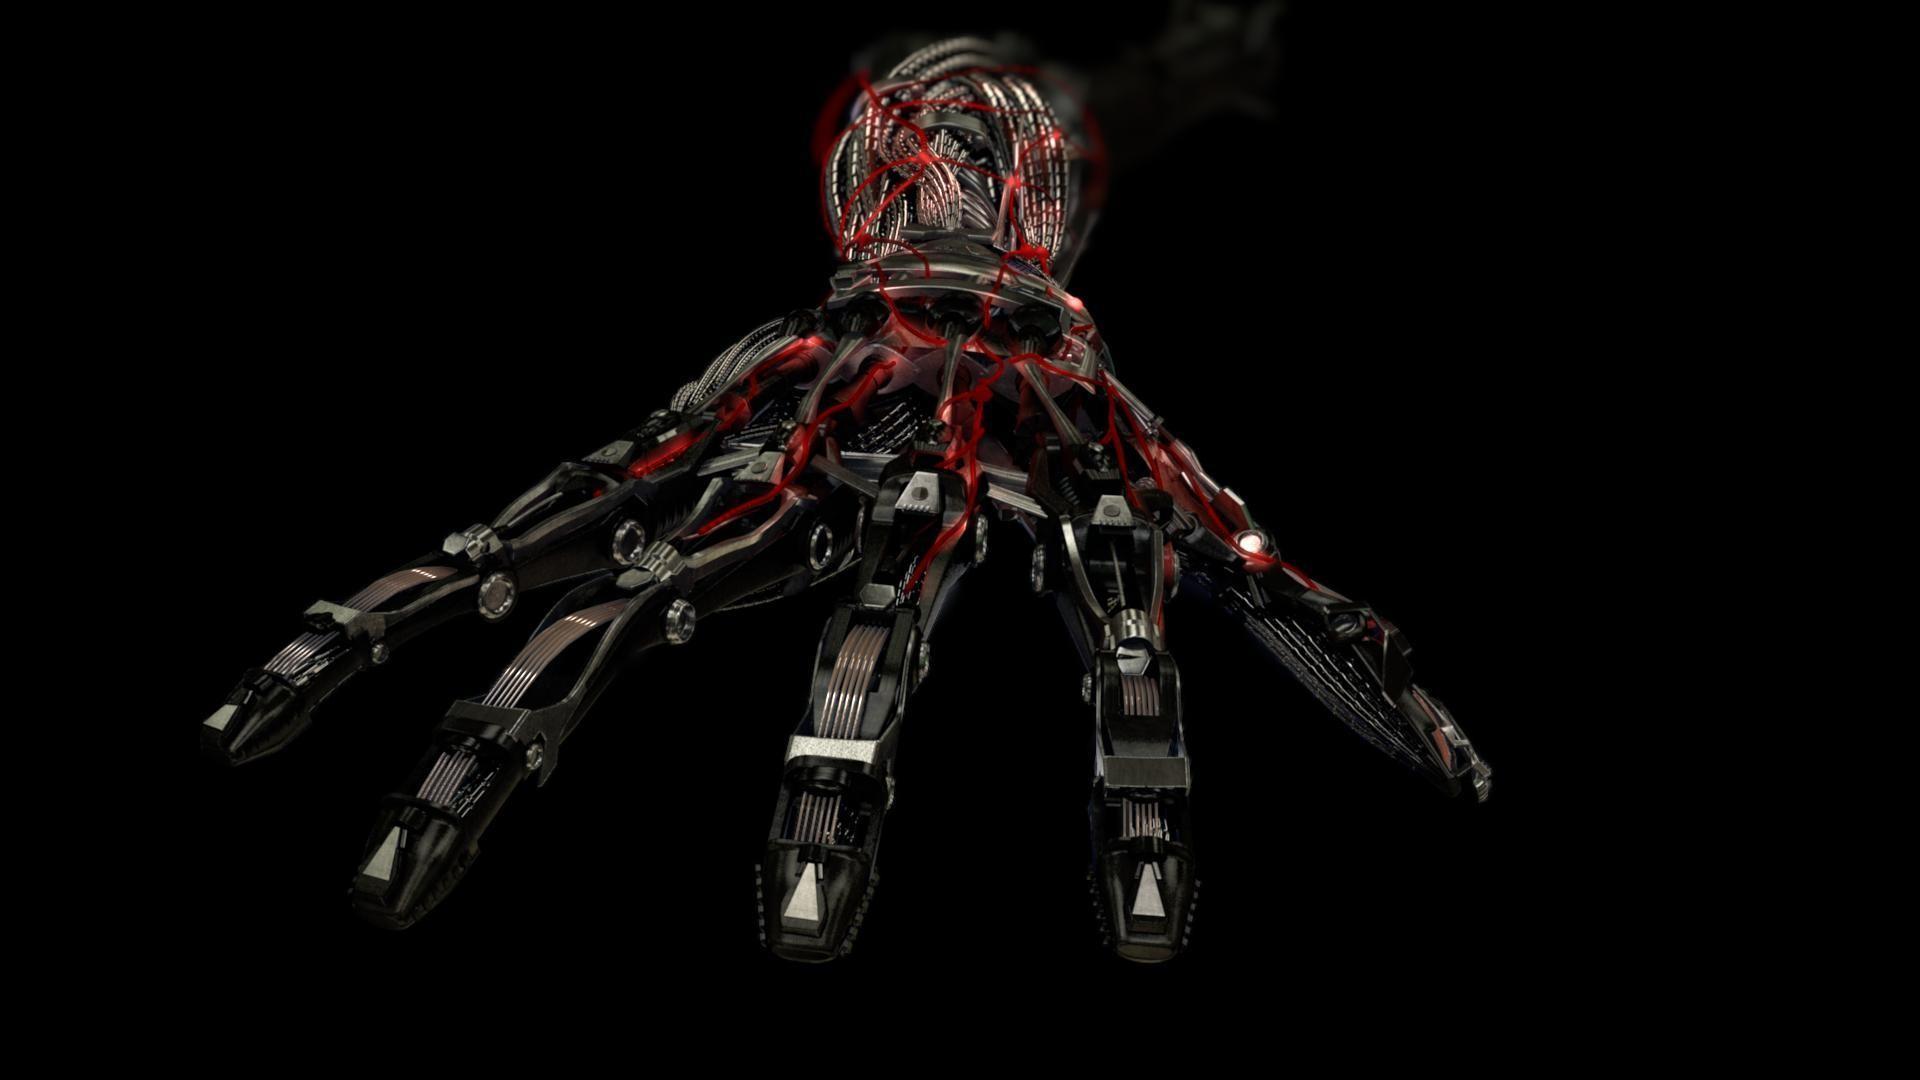 mechanical arm, did at mill few years ago, verizon spot